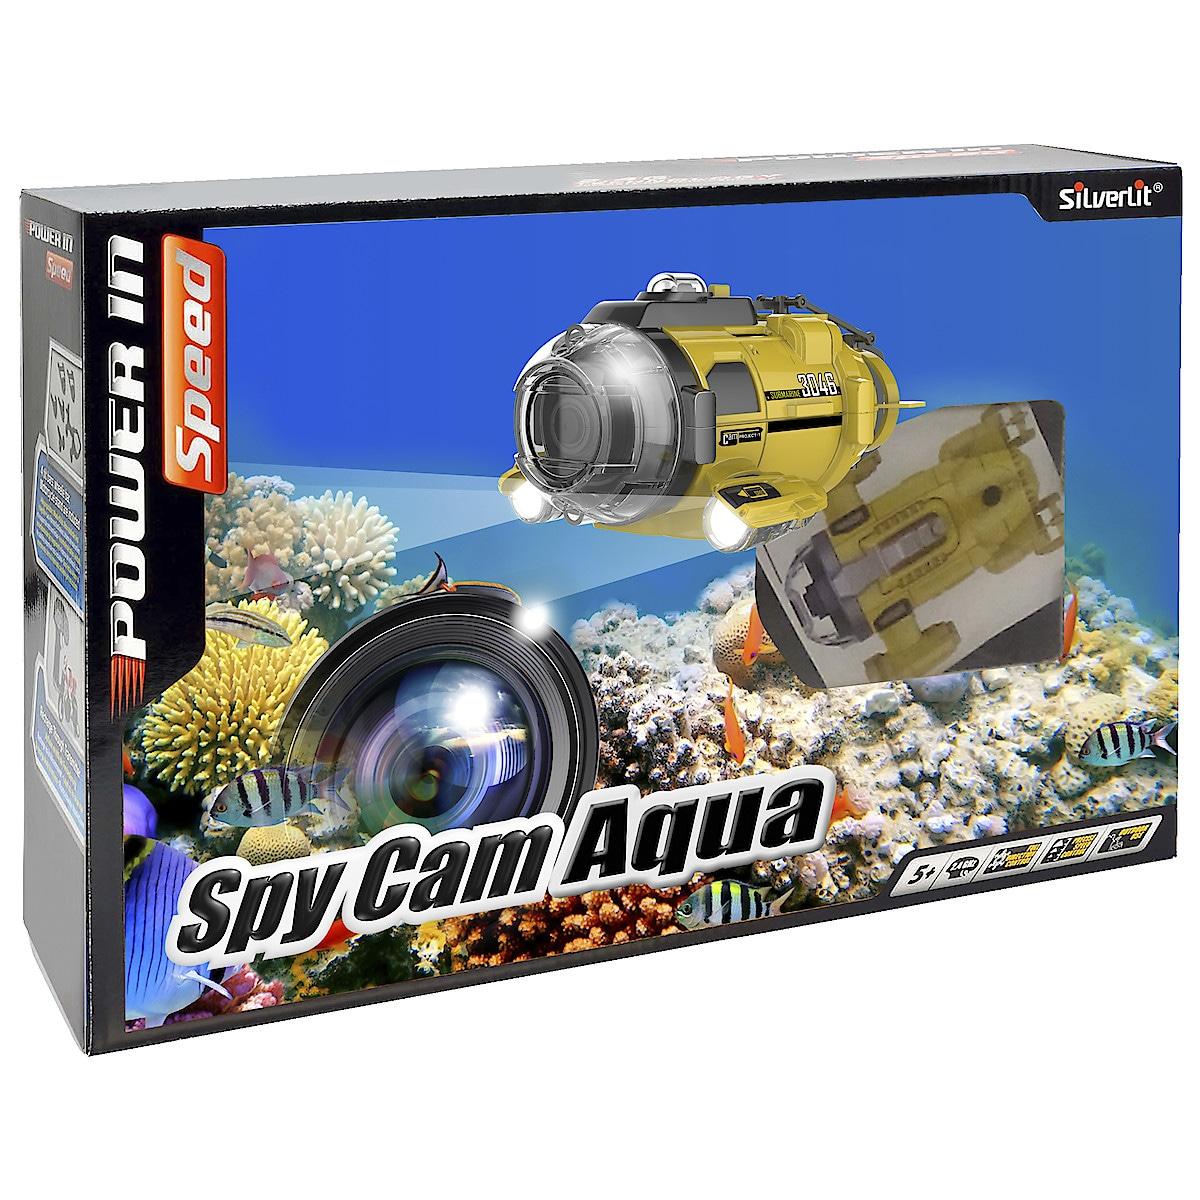 Silverlit Spy Cam Aqua radiostyrt ubåt med kamera